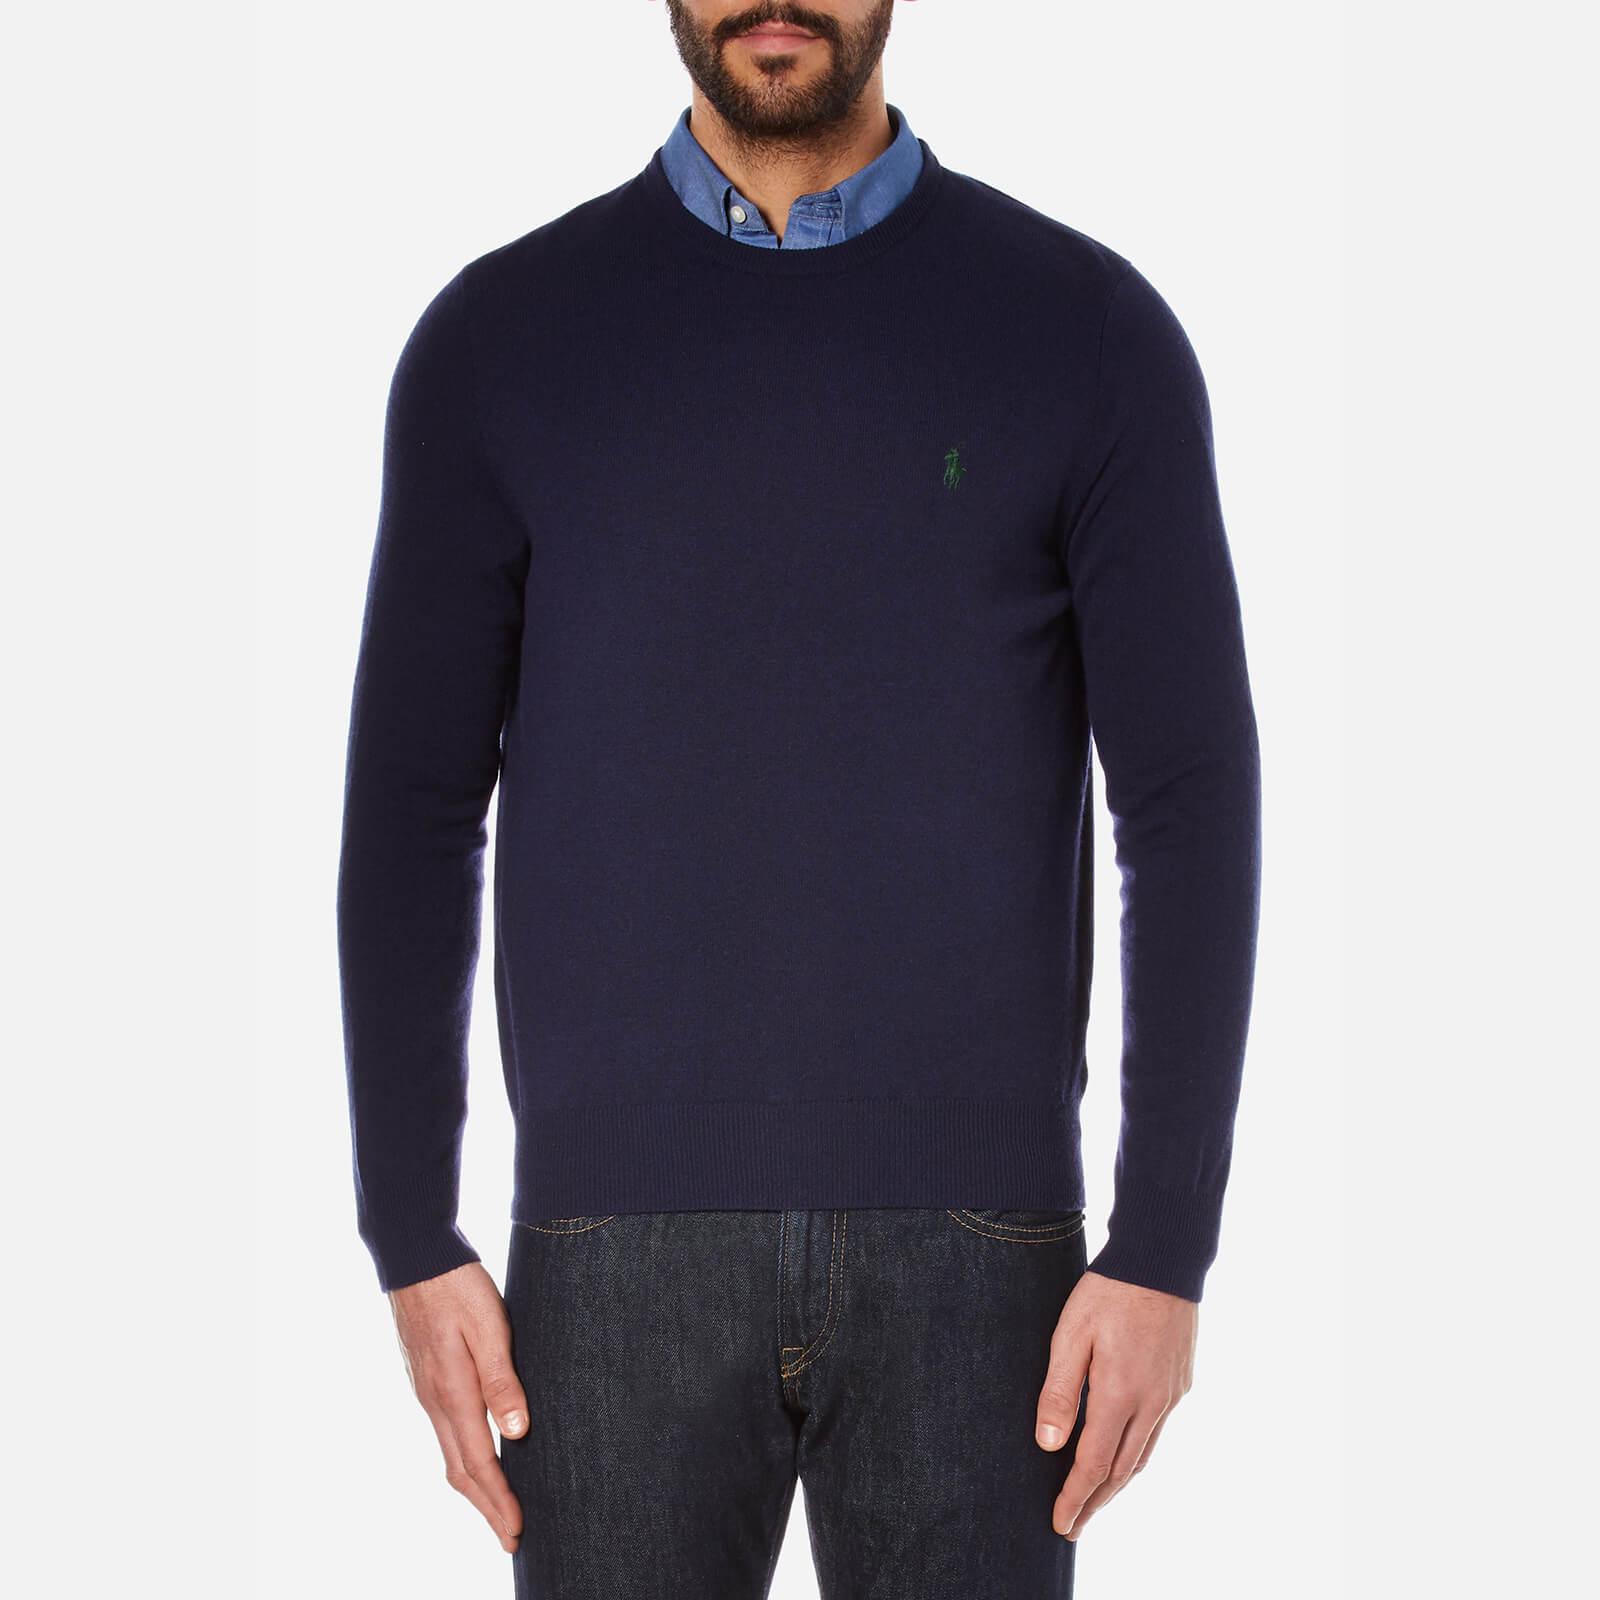 ea09315f35279 Polo Ralph Lauren Men s Long Sleeve Merino Knit Jumper - Hunter Navy - Free  UK Delivery over £50